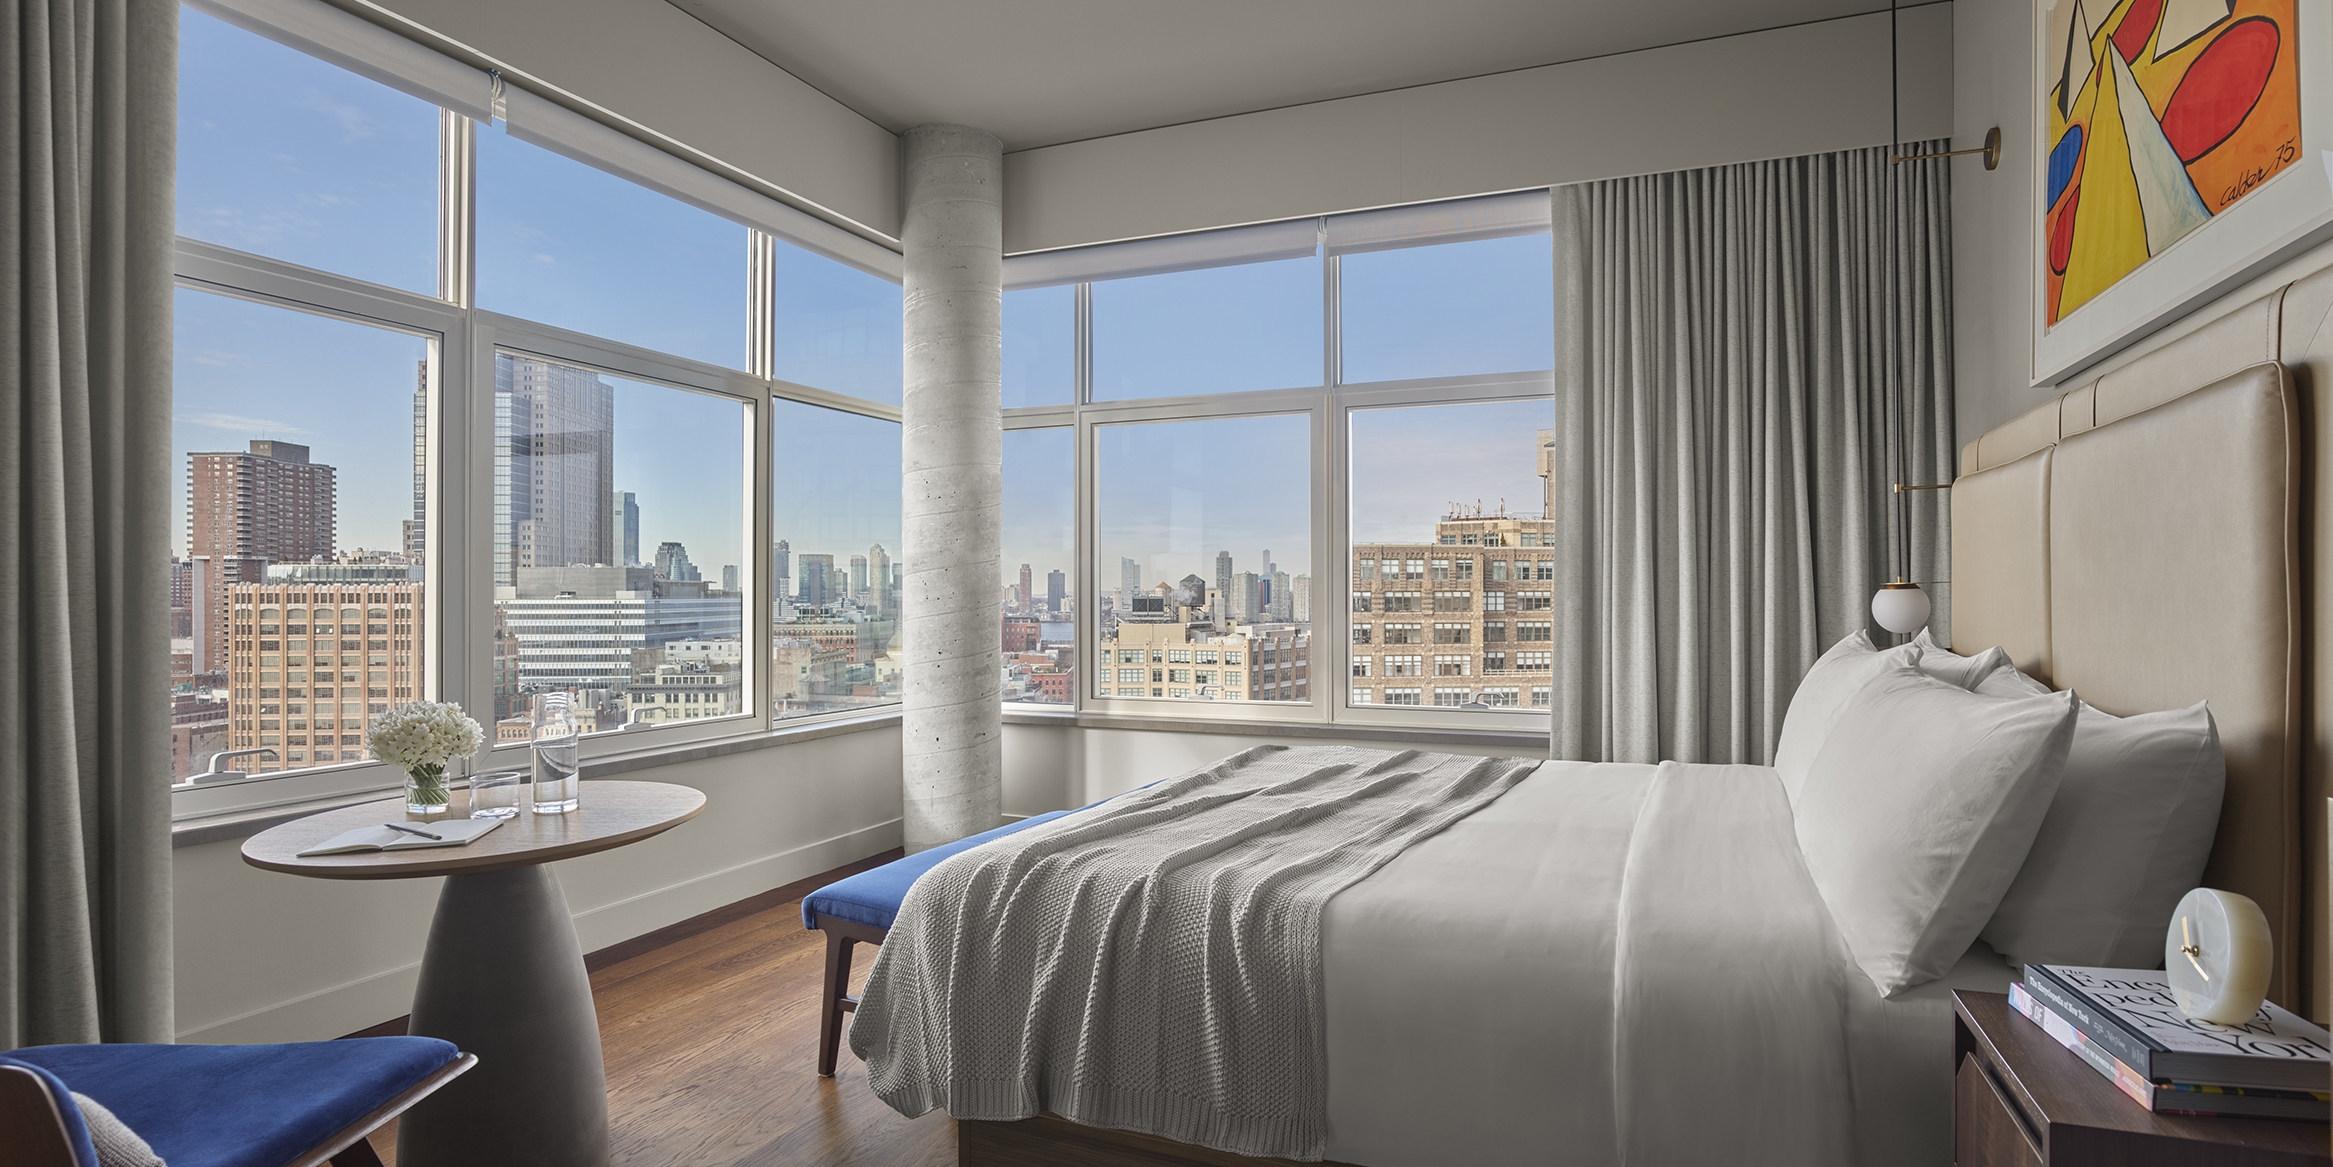 ModernHaus SoHo opens in downtown Manhattan